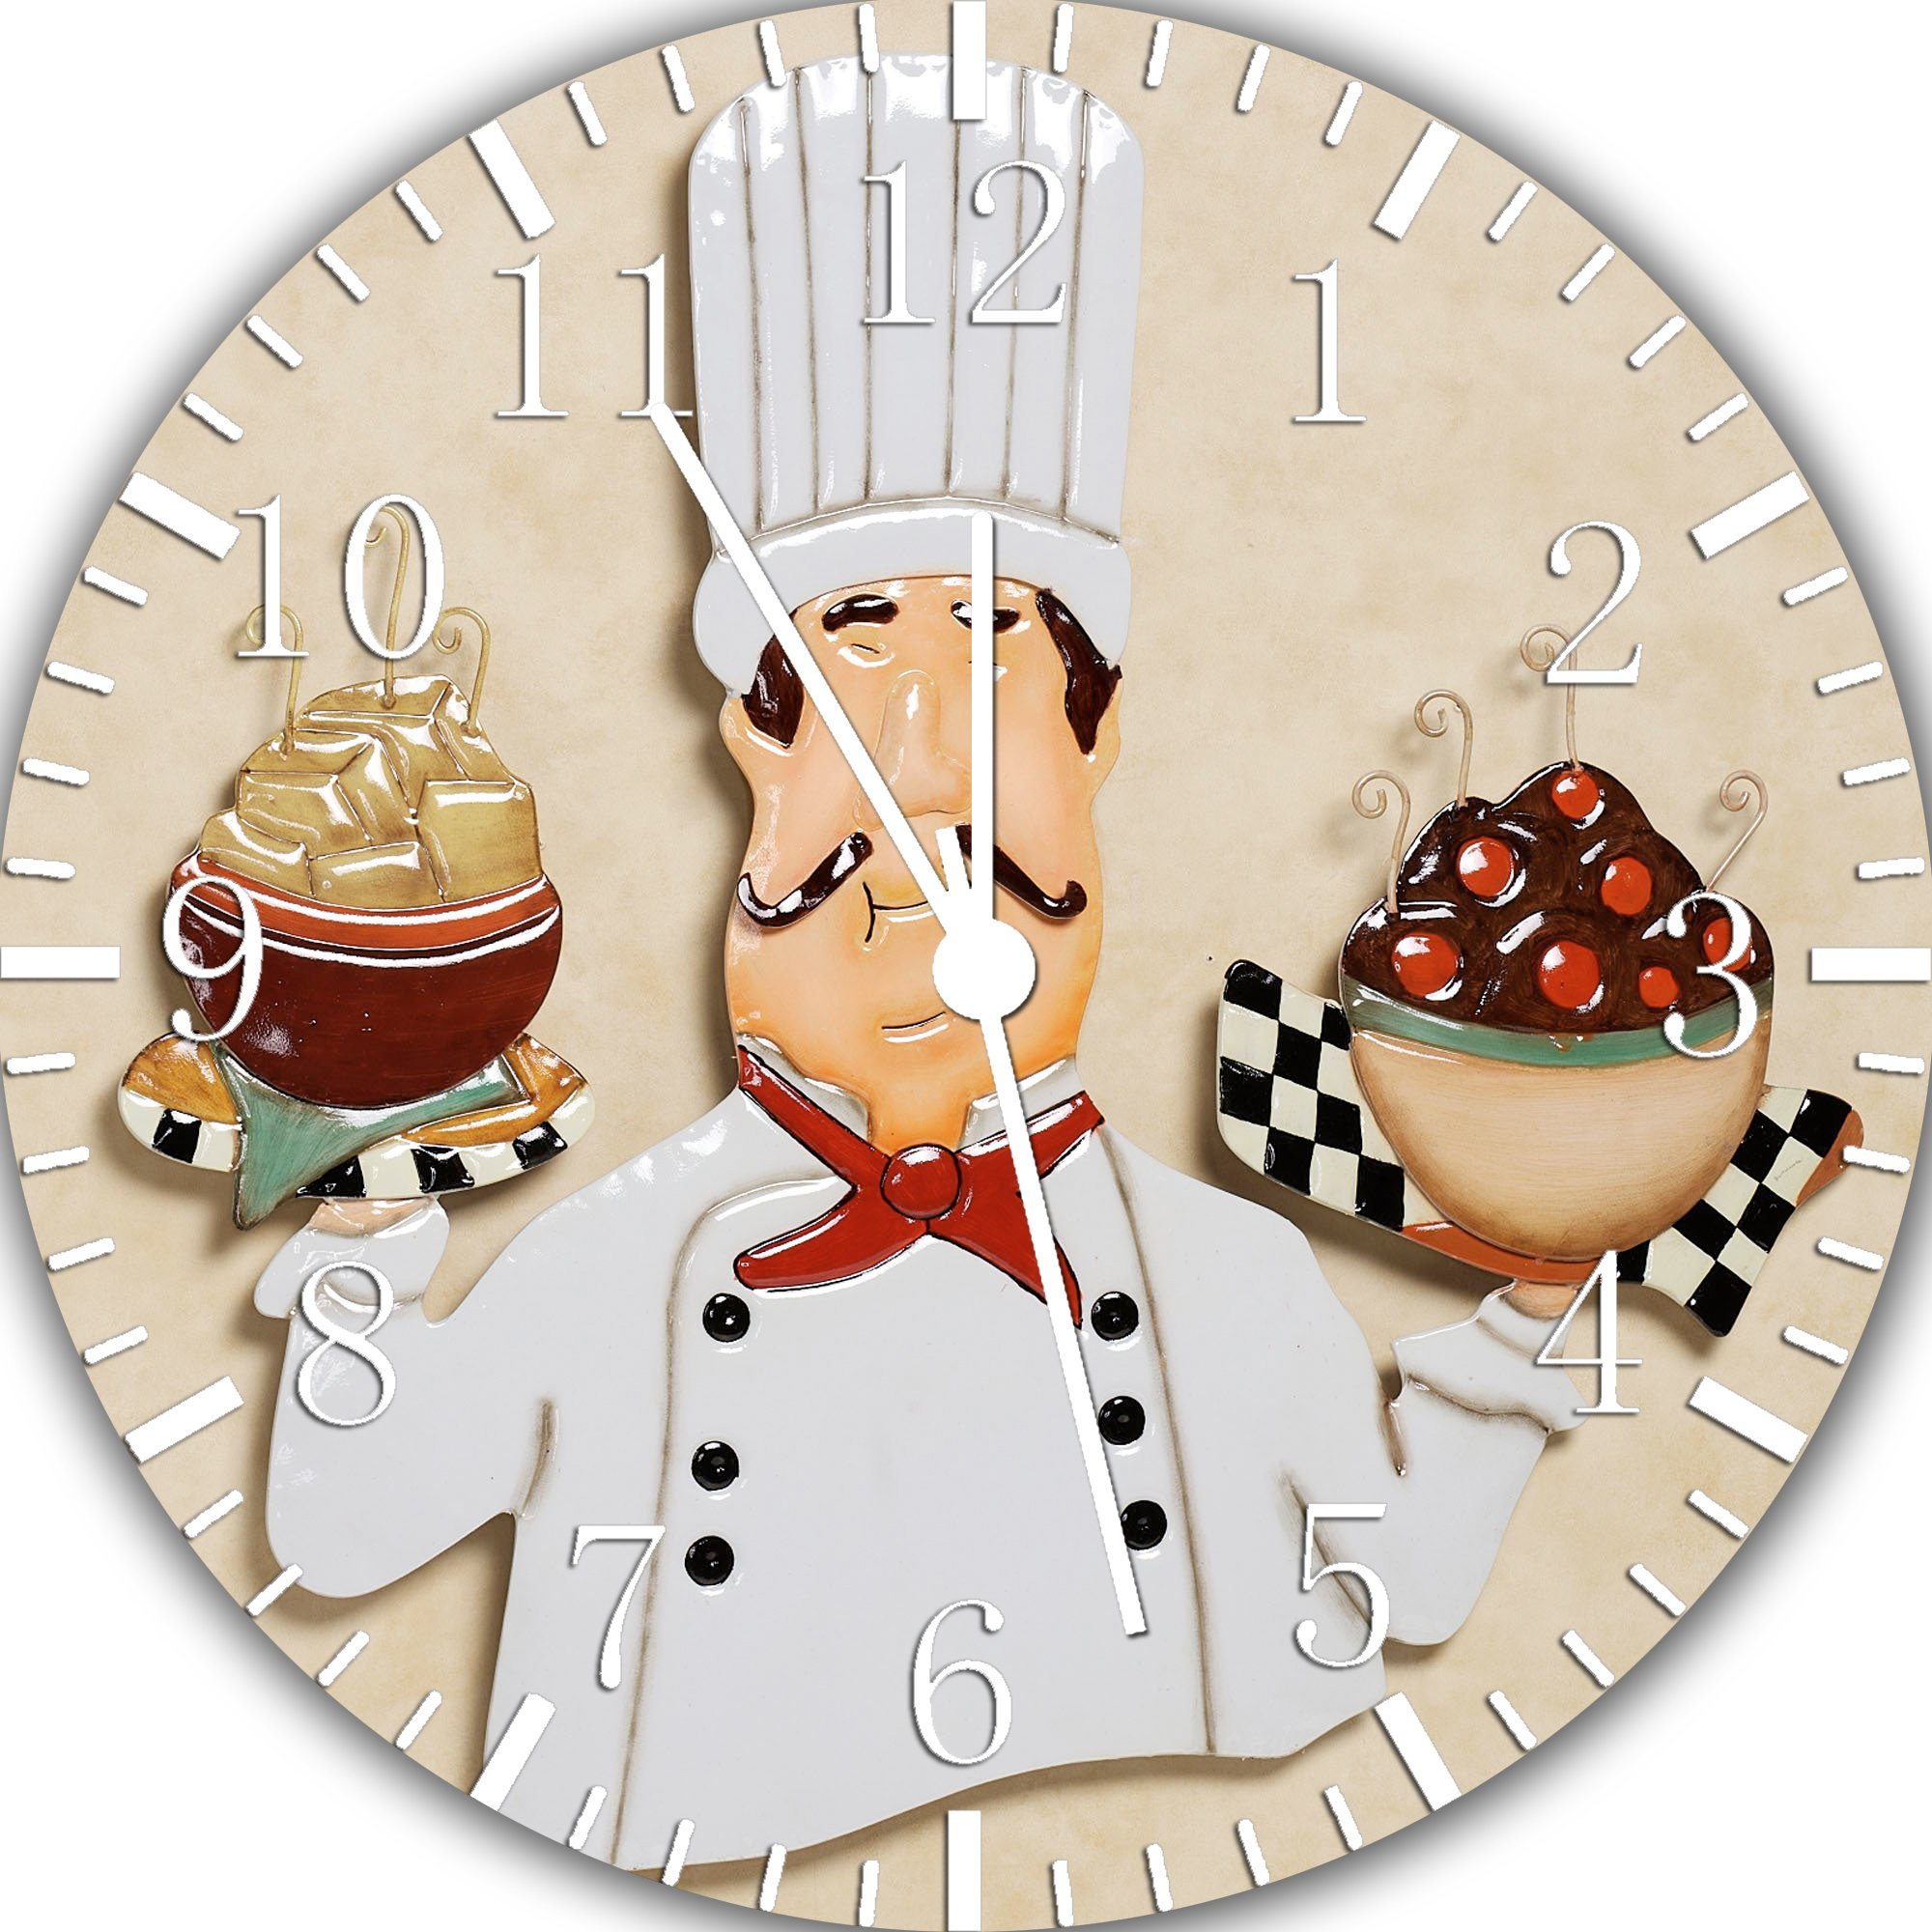 Chef Frameless Borderless Wall Clock W367 Nice For Gift or Room Wall Decor